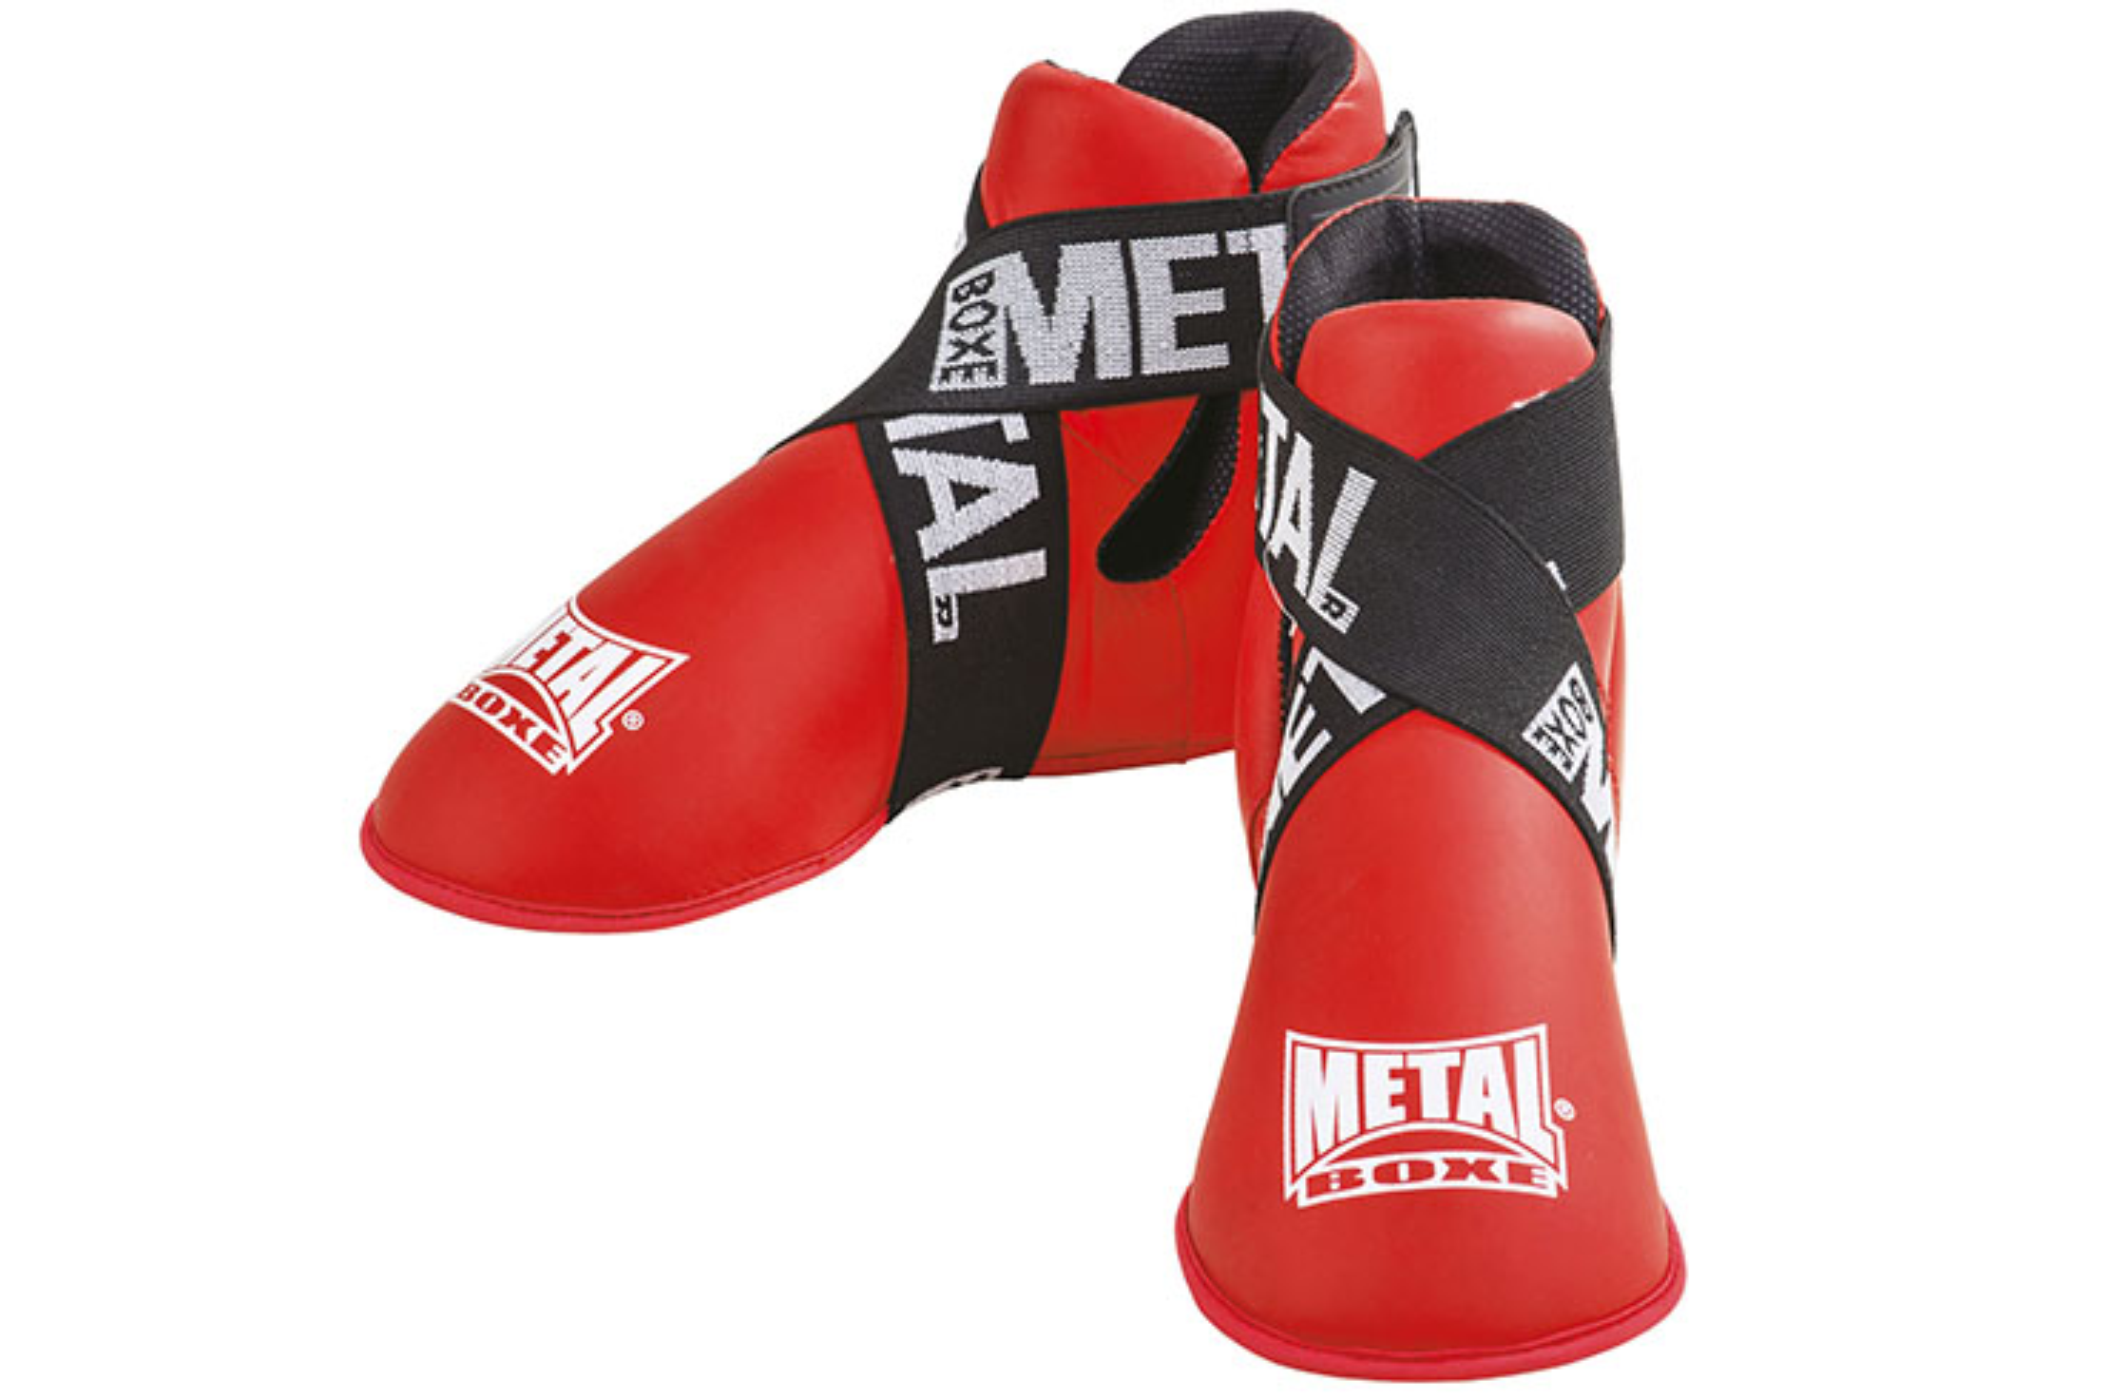 Protector pies, Full Contact - MB165, Metal Boxe